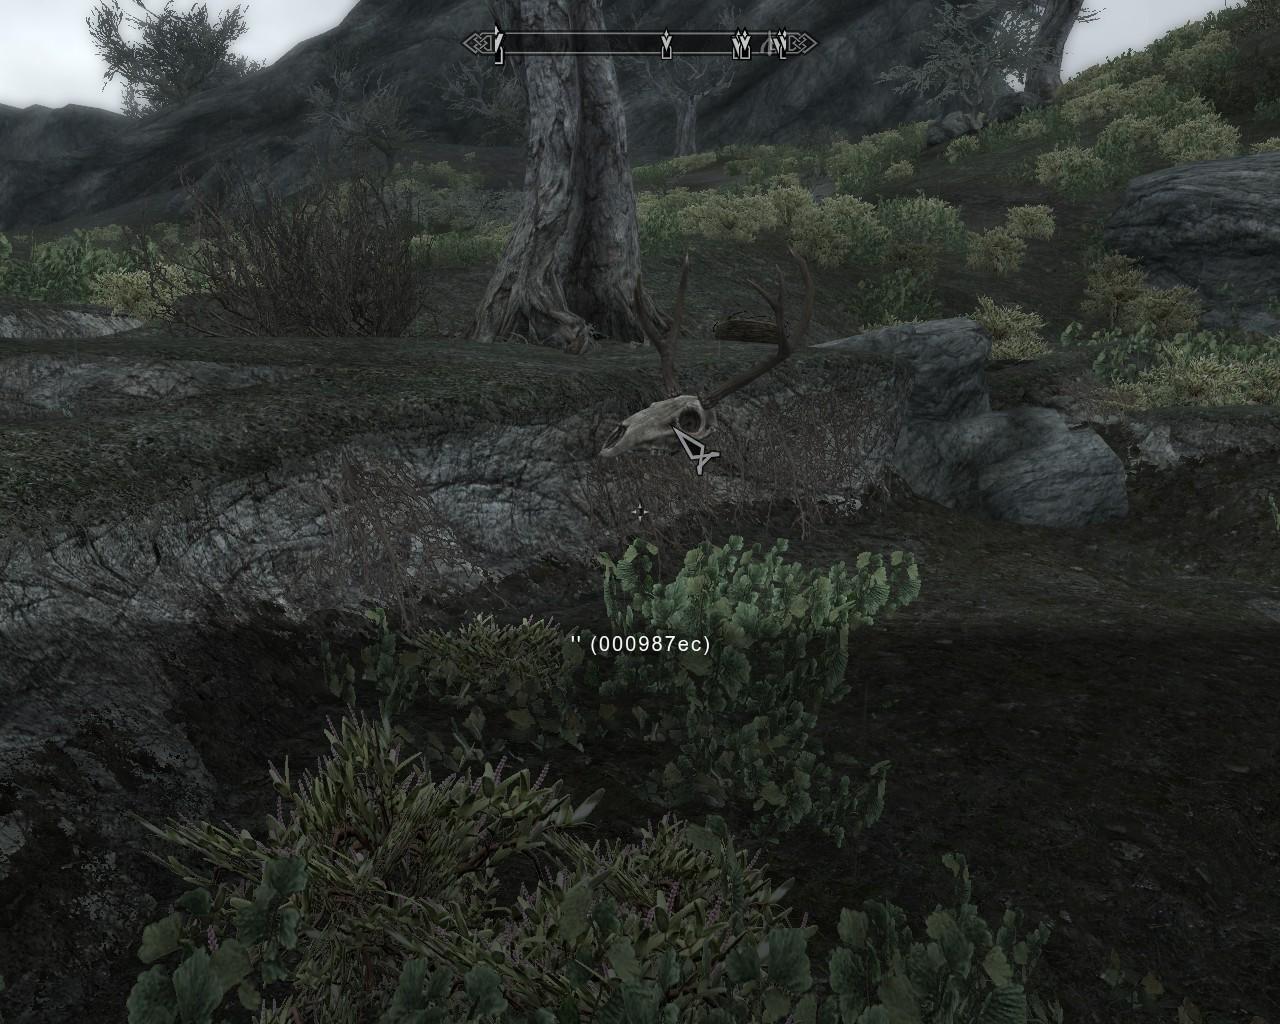 Floating deer skull